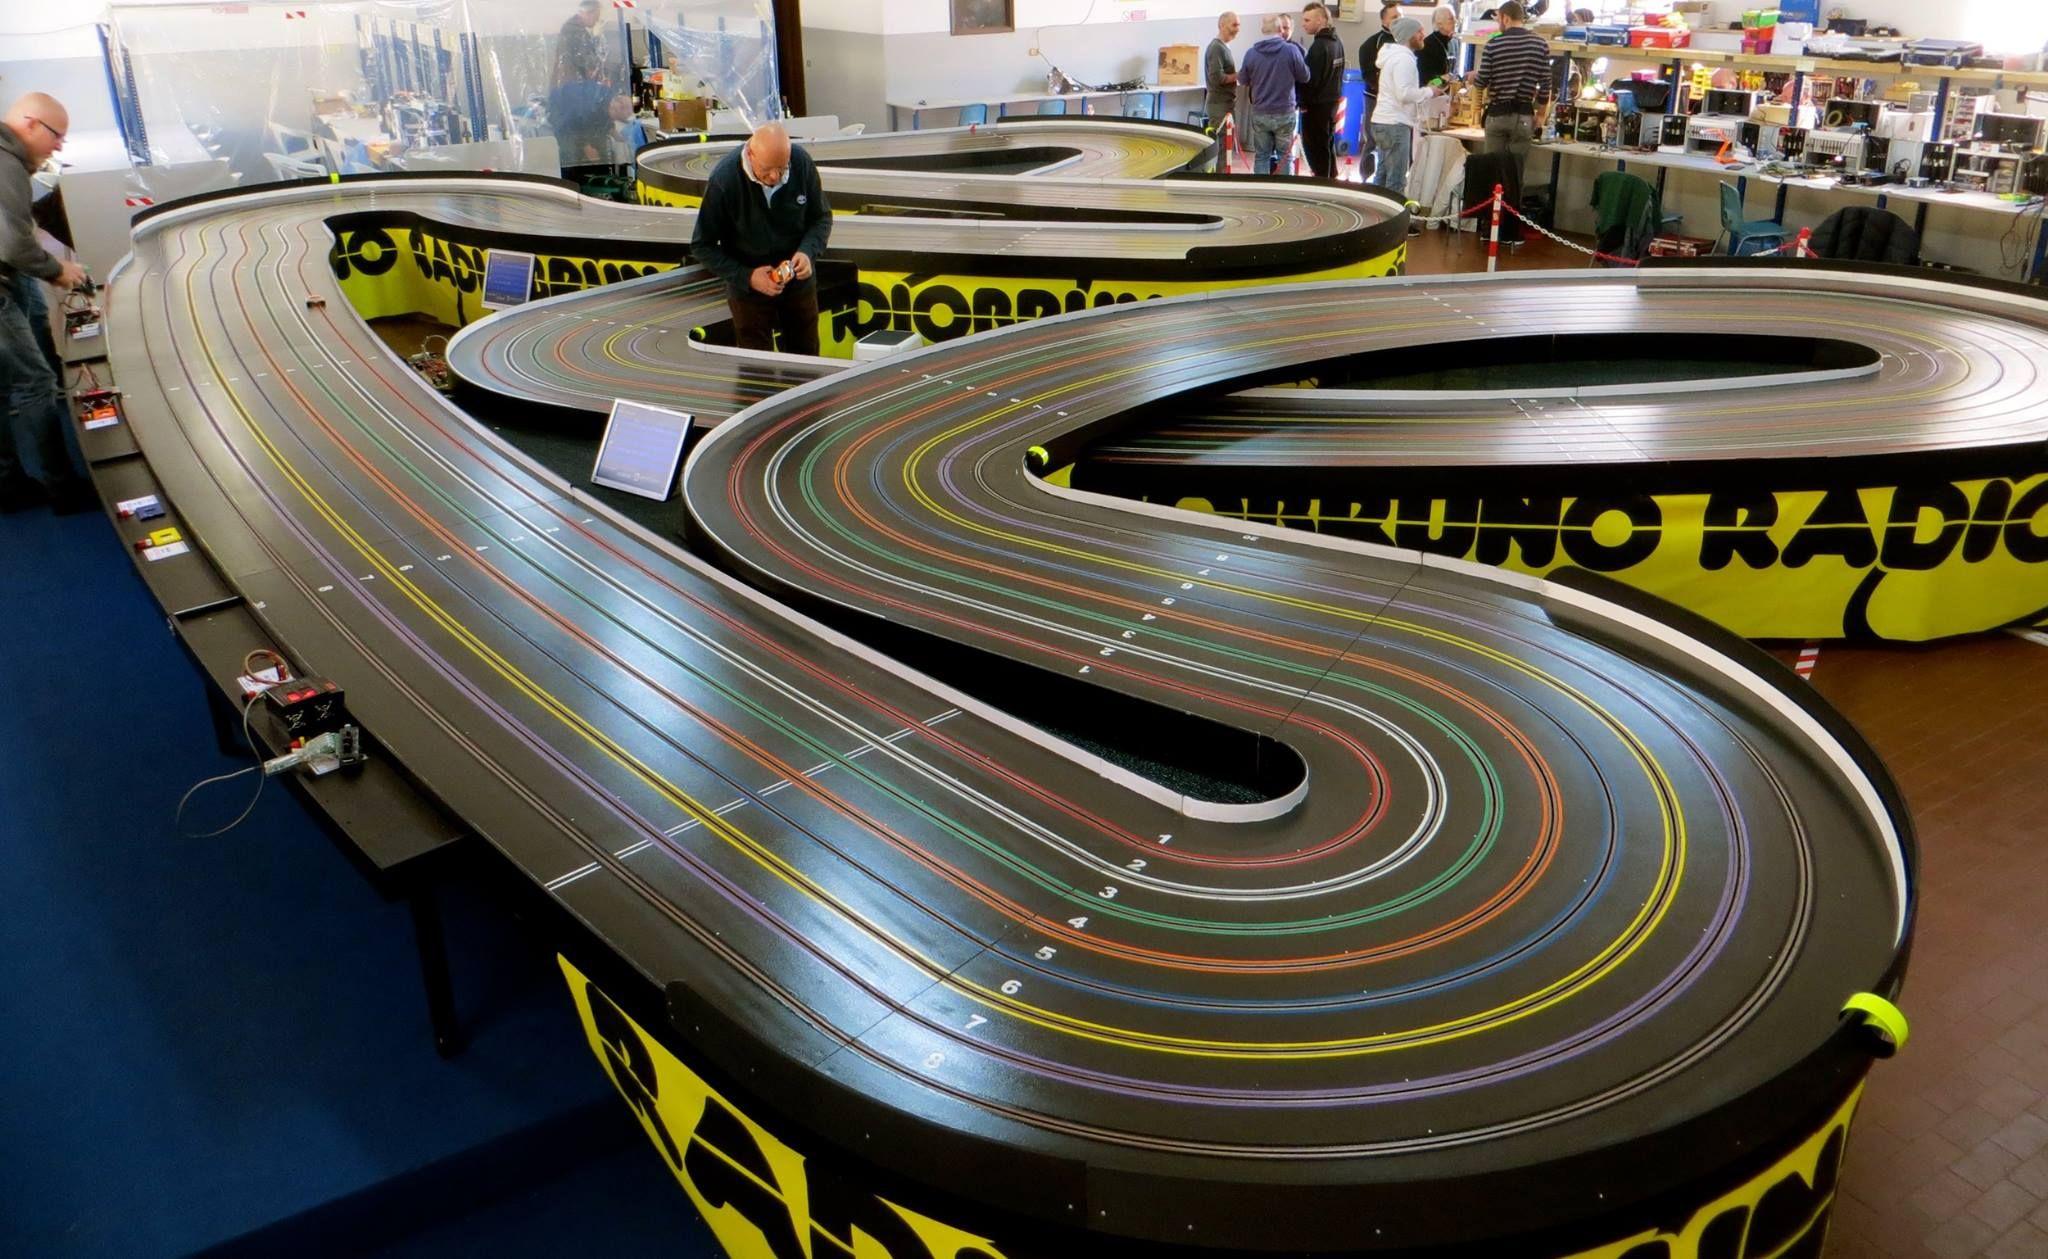 Tuscany Slot Club Slot Car Racing Slot Cars Slot Car Tracks